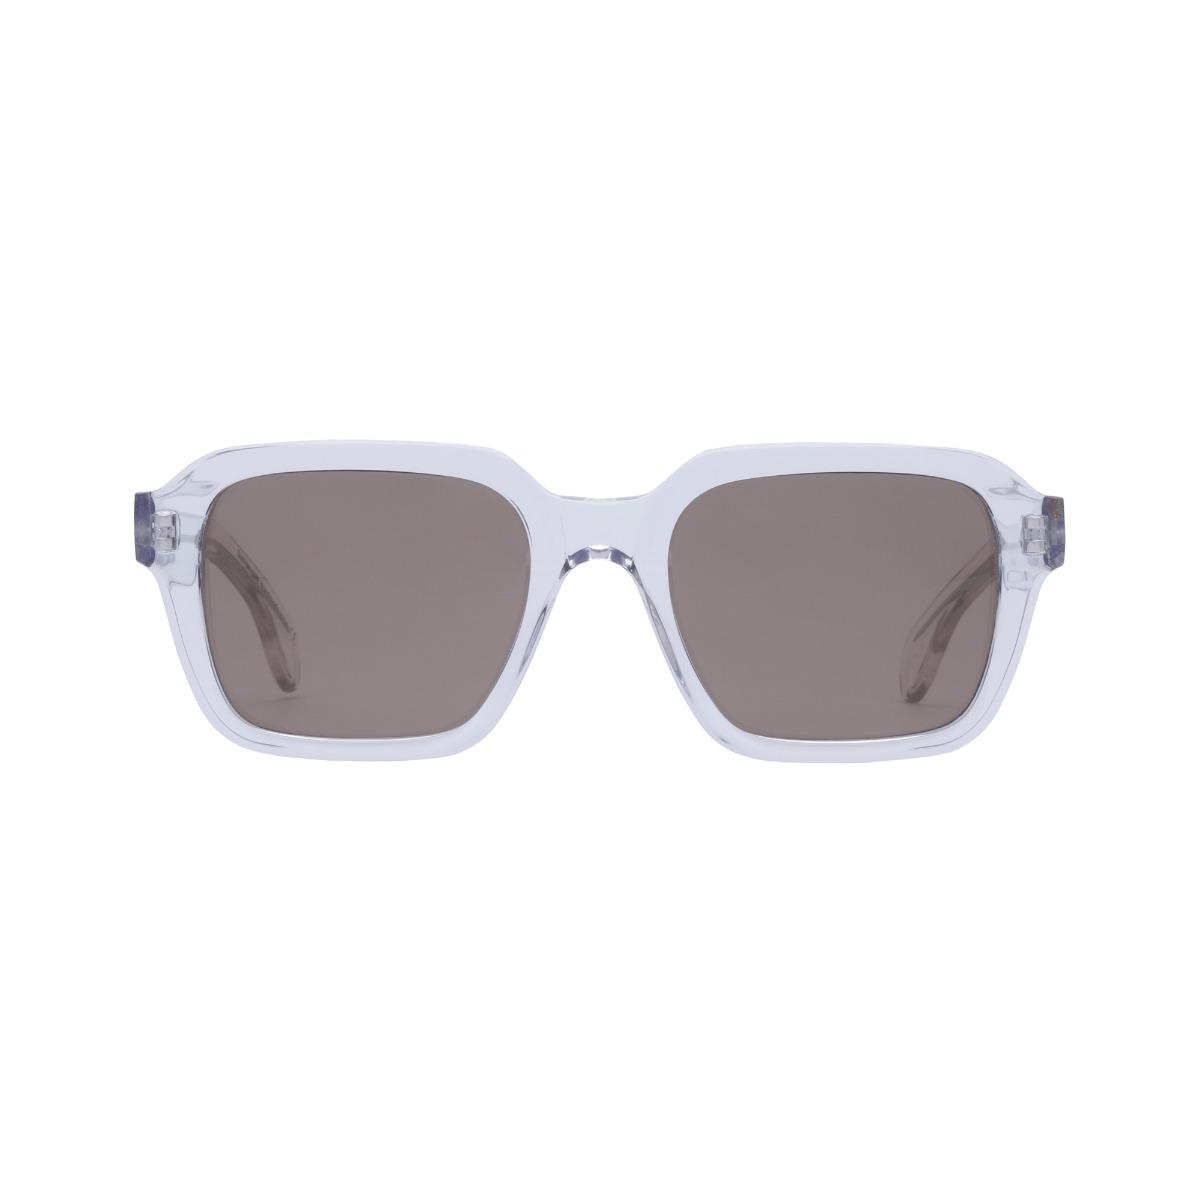 Lino Eco Transparent // Gradient Grey